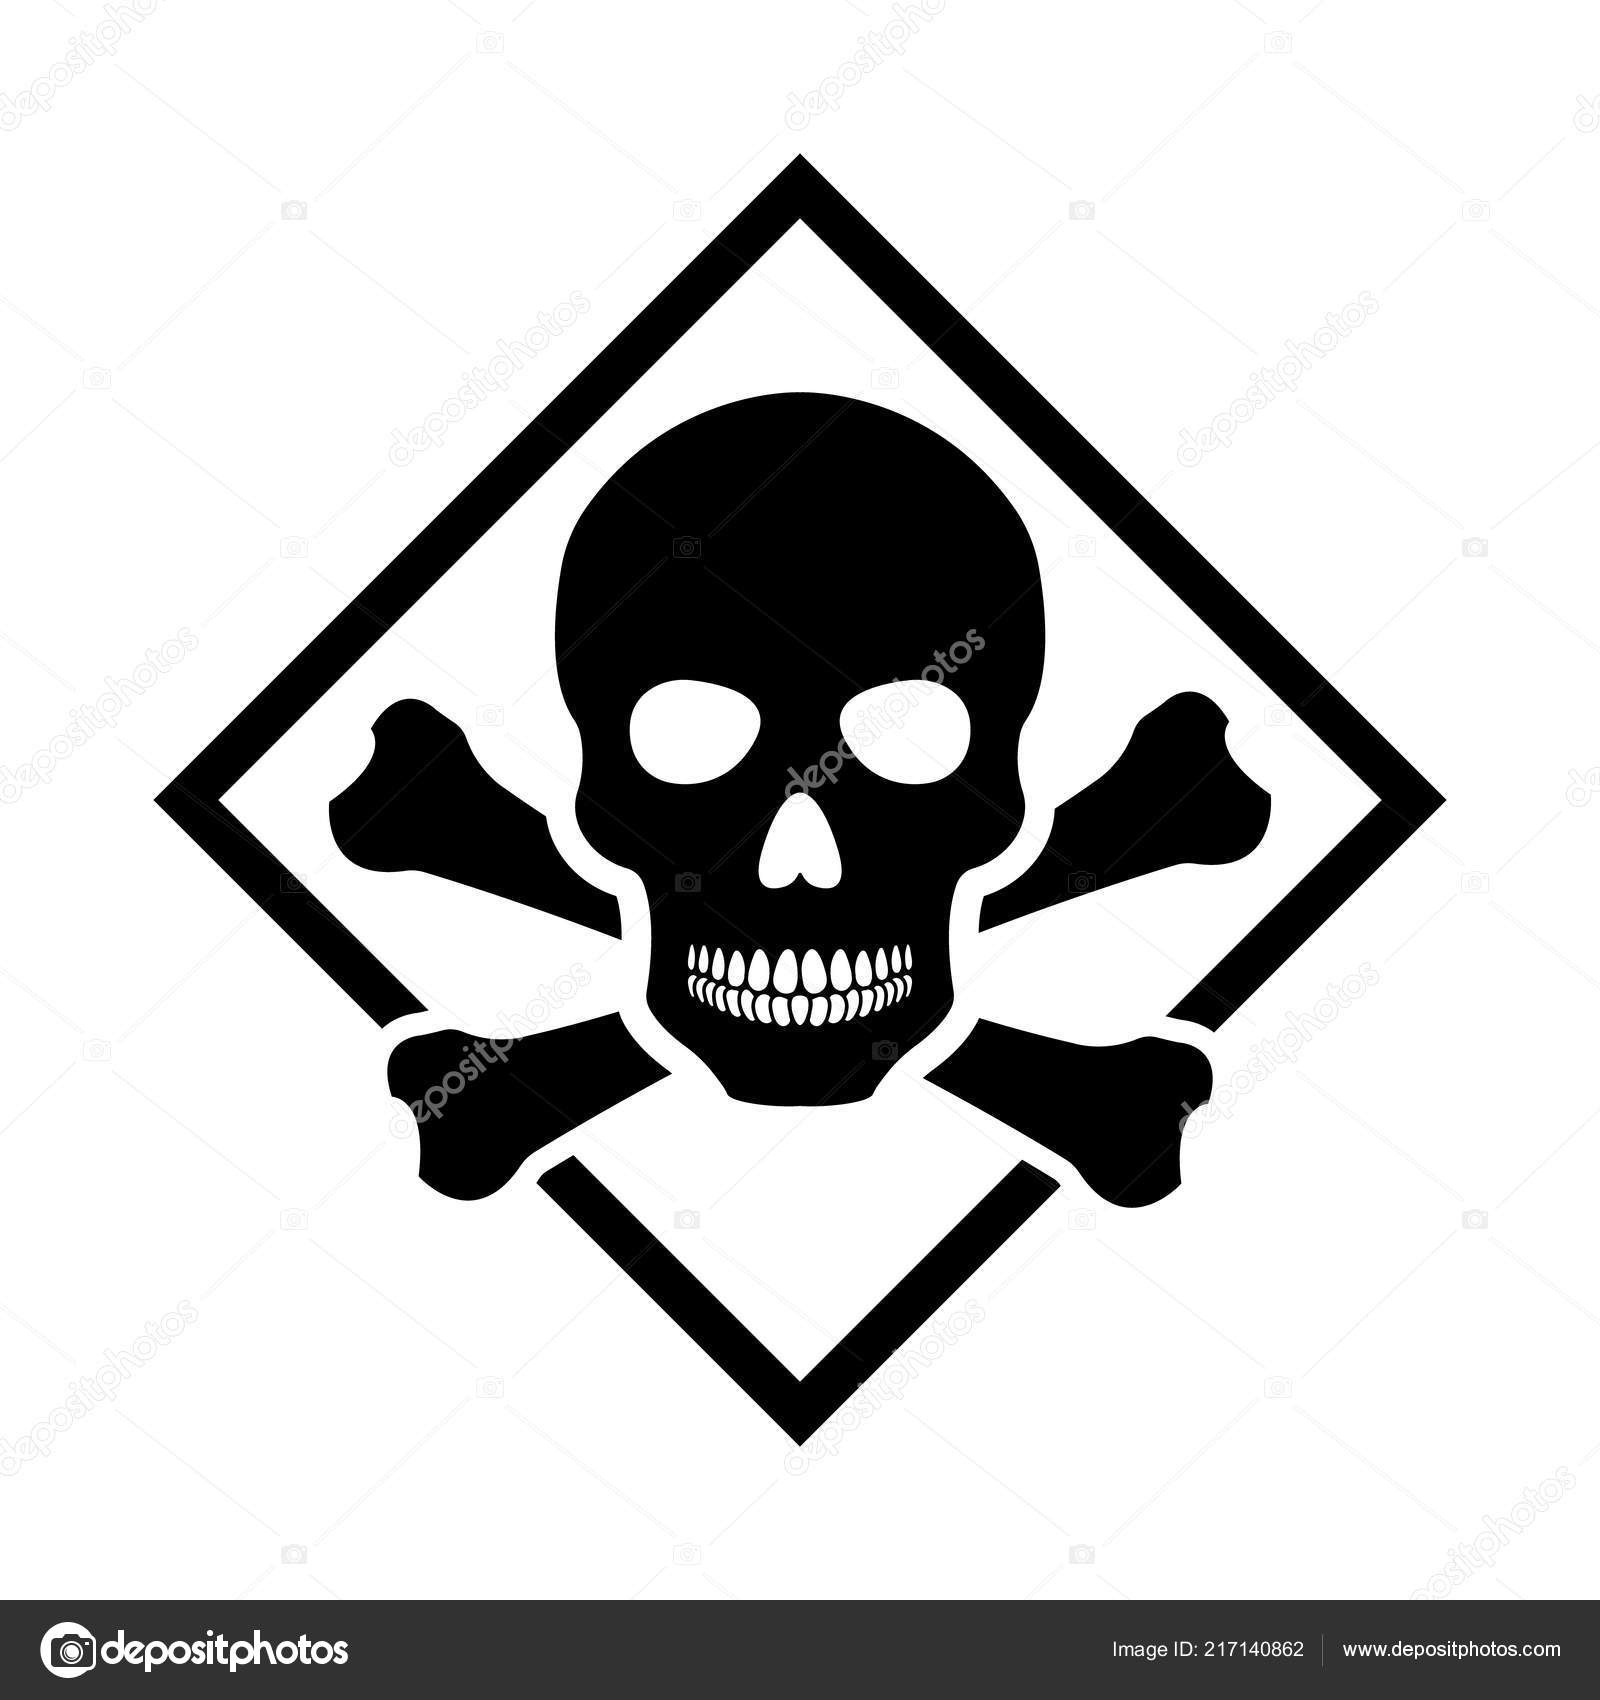 Toxic Safety Hazard Danger Harmful Malware Virus Sign Illustration